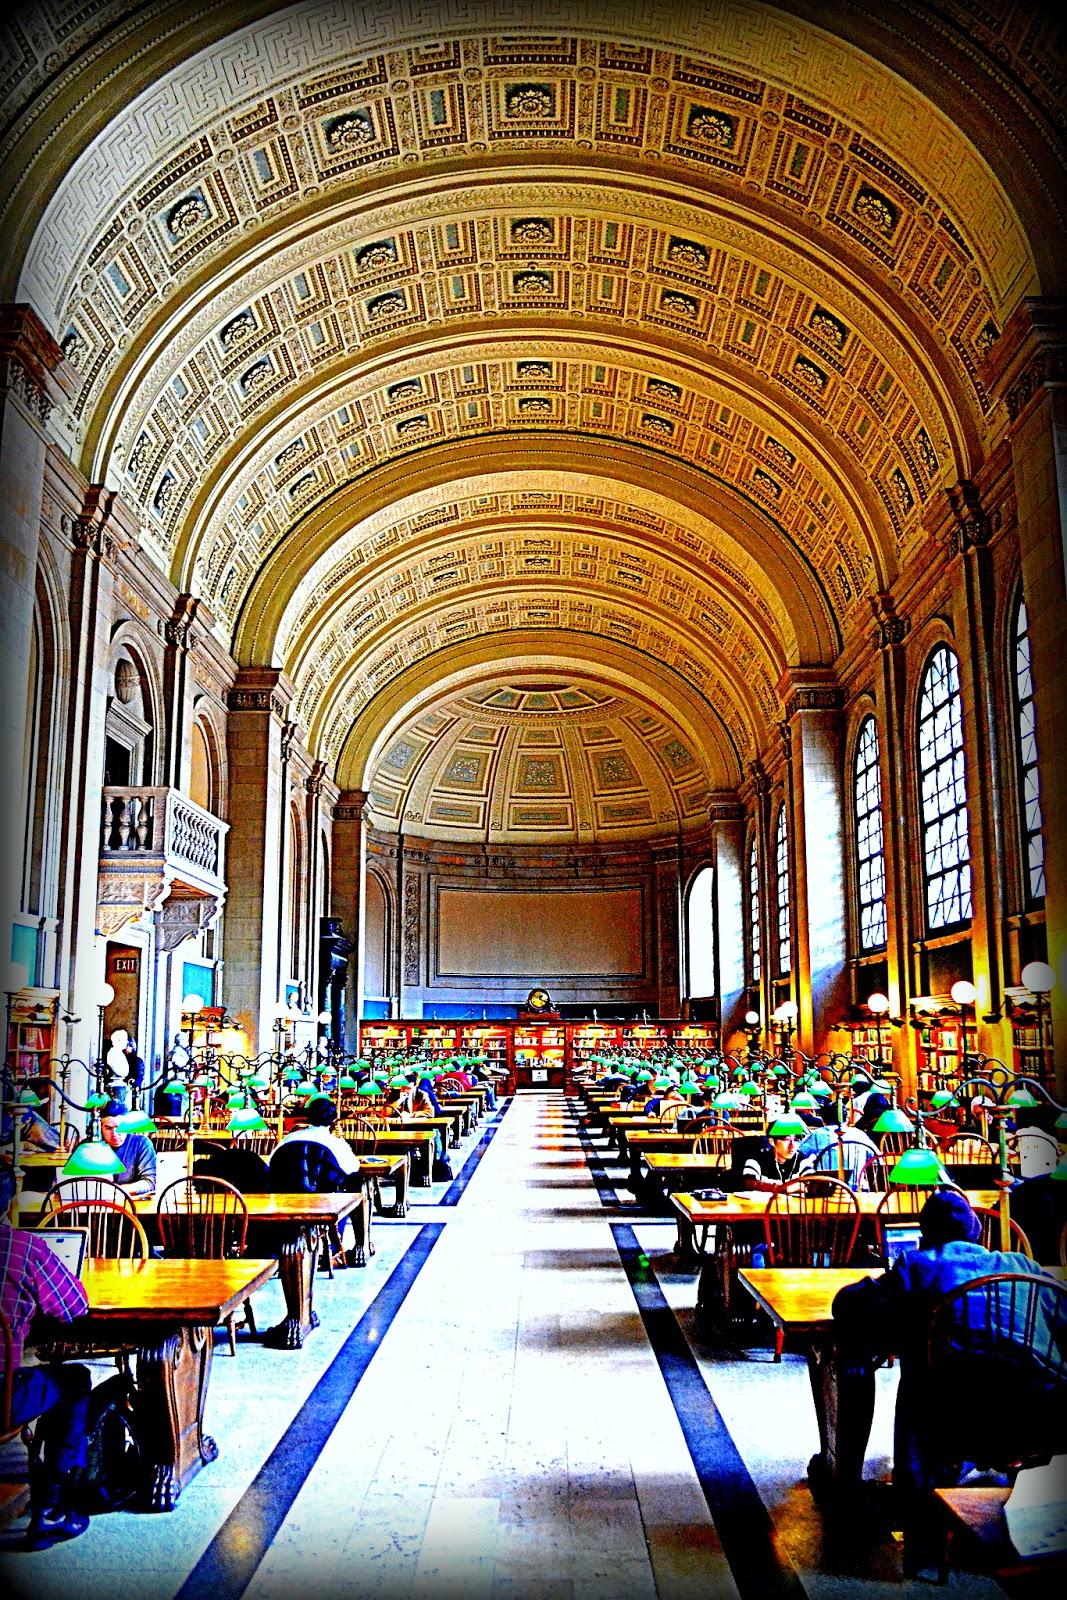 bates hall, bpl.org, boston public library, boston, reading room, reading